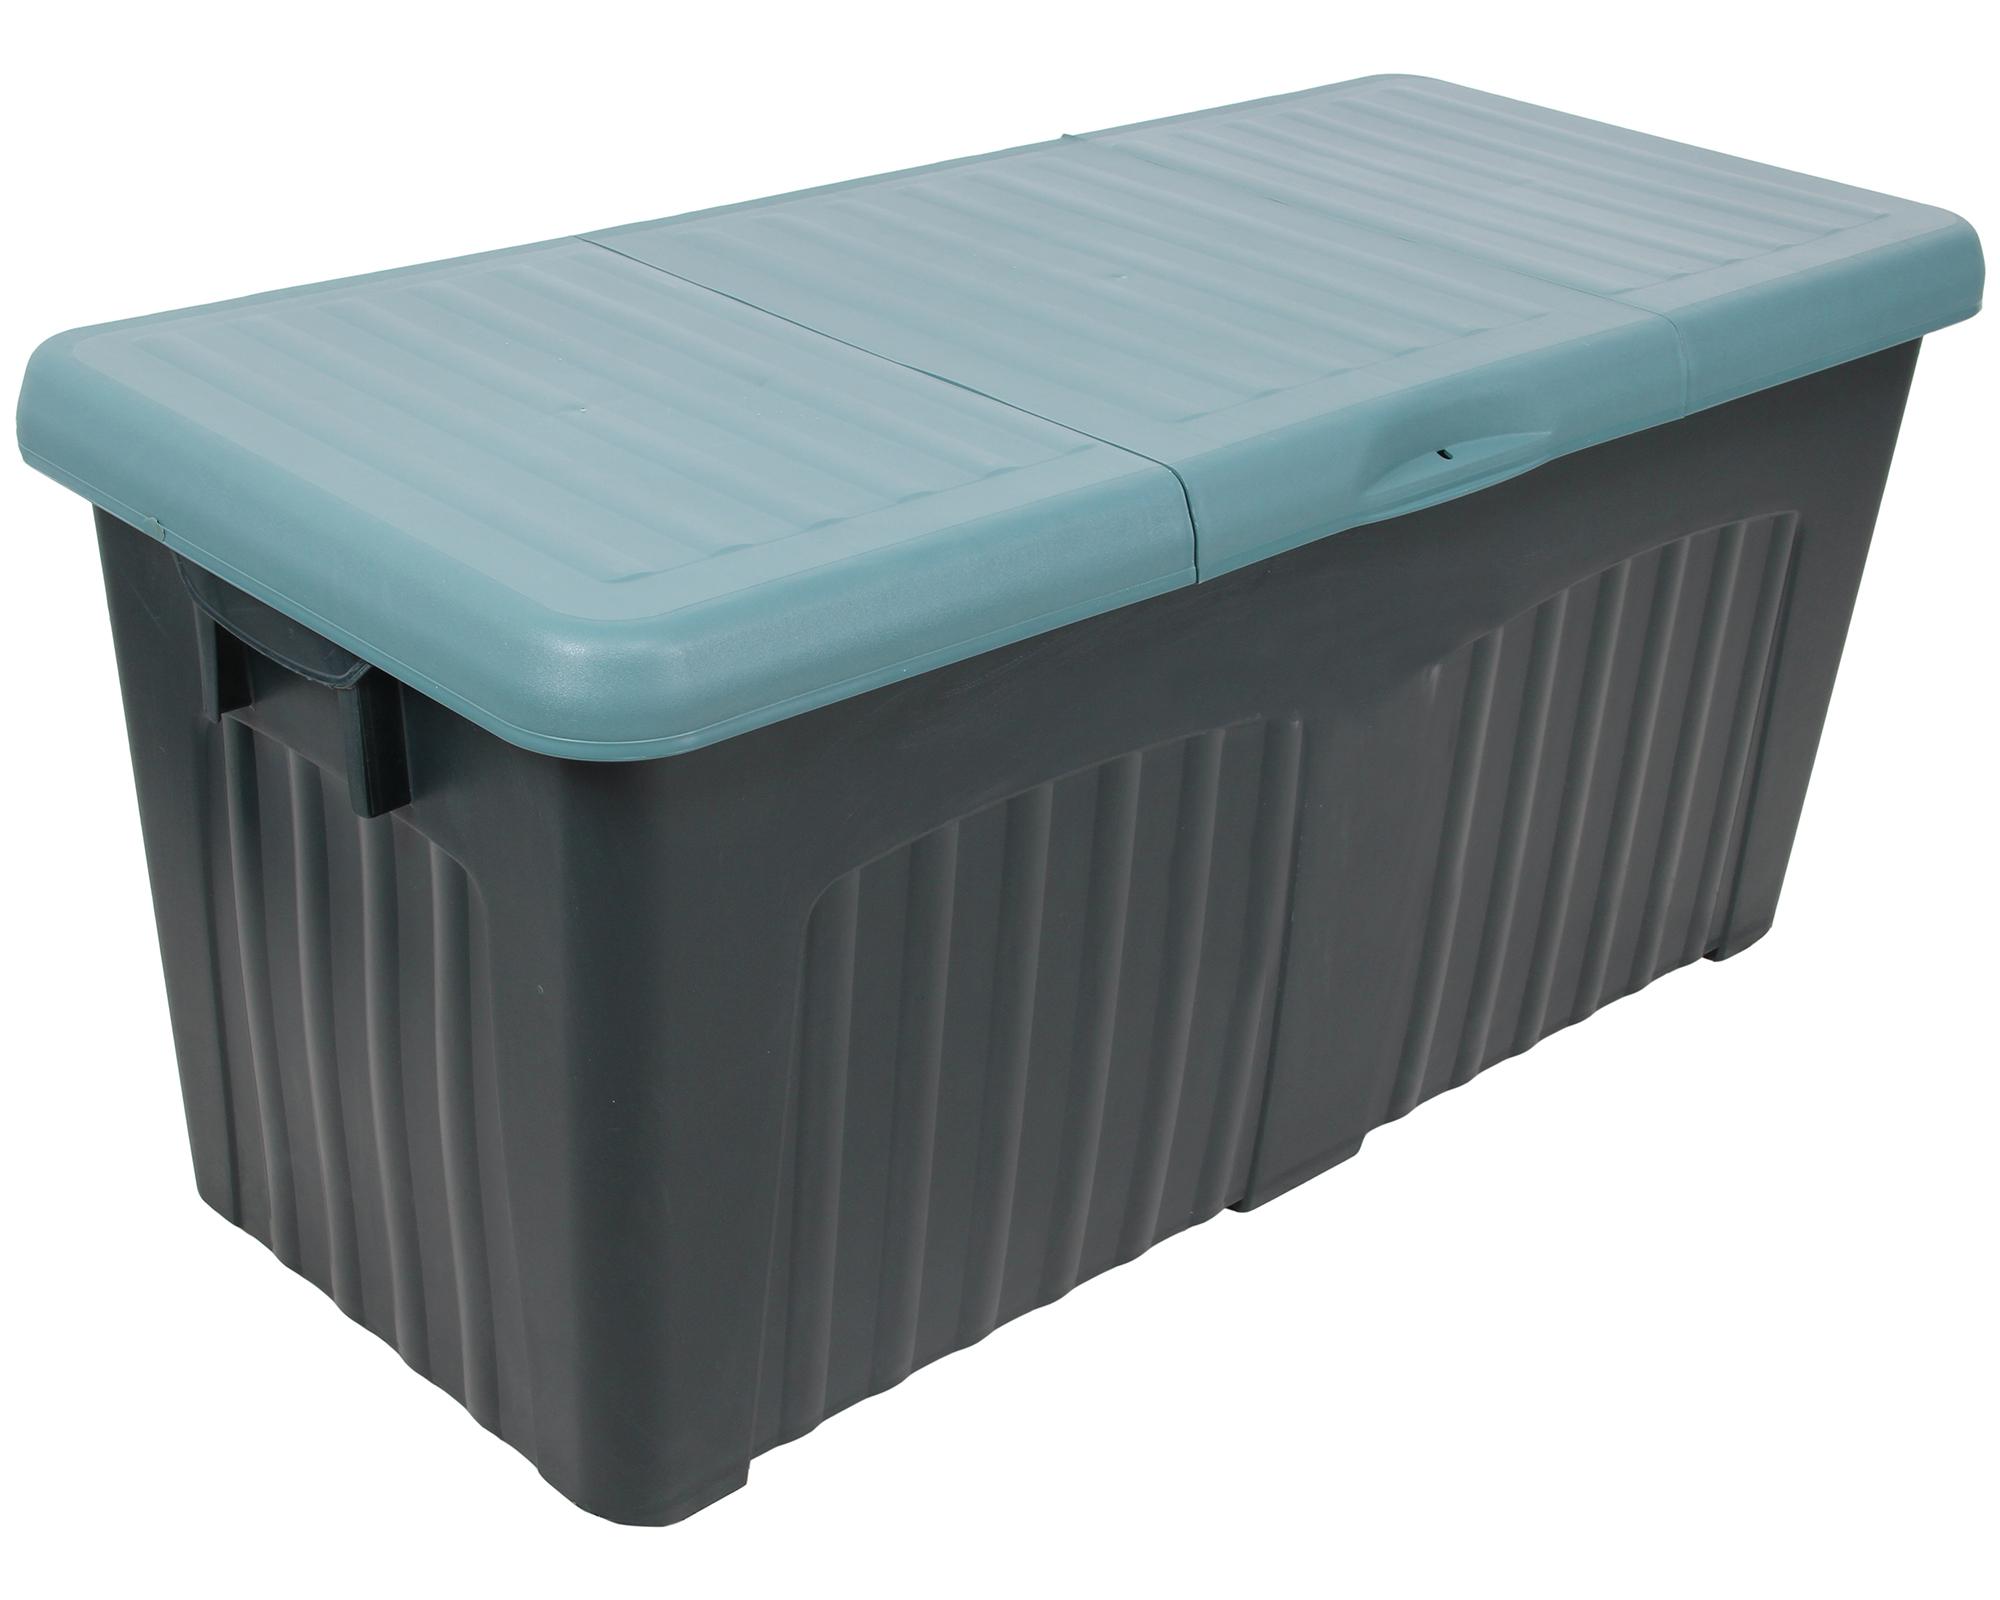 ondis24 lagerbox transportbox pandora gr n grau g nstig online kaufen. Black Bedroom Furniture Sets. Home Design Ideas